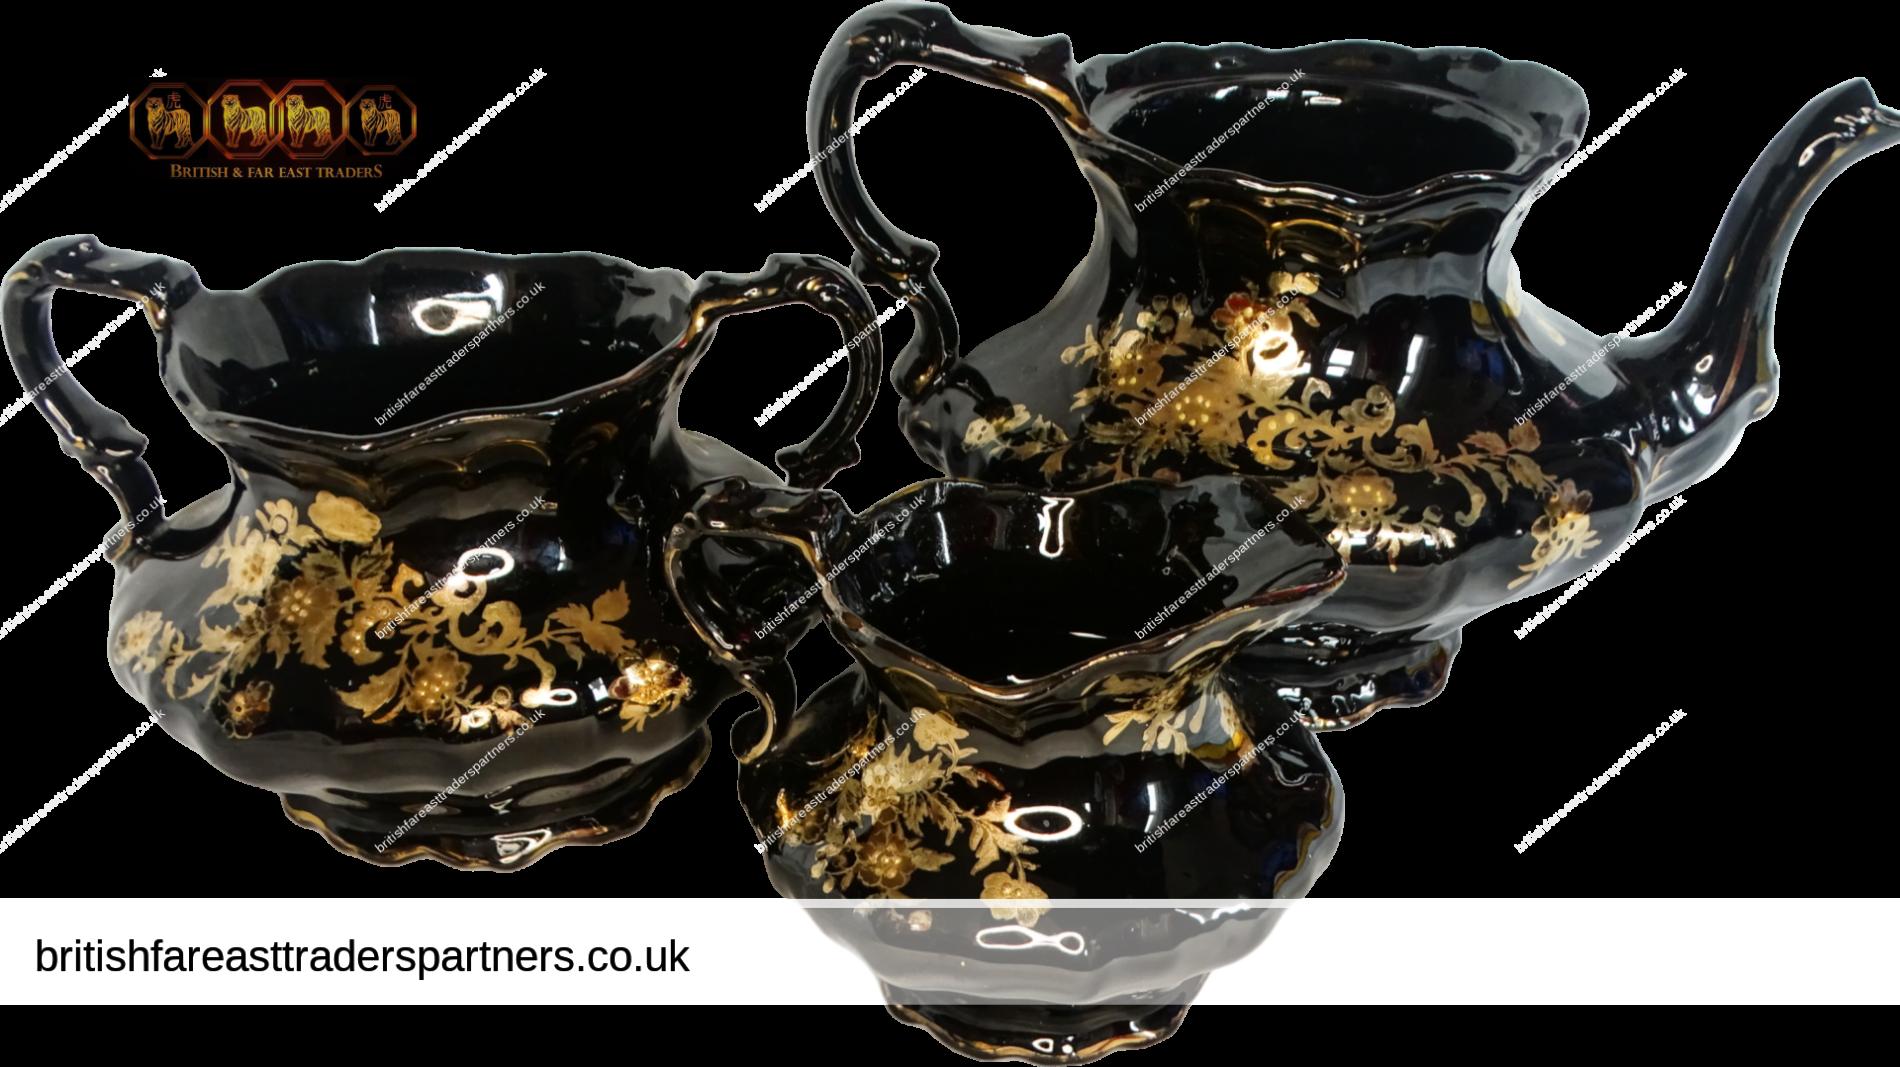 VINTAGE  STUNNING LOT OF 3 VICTORIAN COLLECTABLES  Tea Pot | Sugar Pot | Creamer Jug BLACK & GOLD FLORAL FOLIATE TEA SERVER | DISPLAY COLLECTABLES | VICTORIAN HOMEWARE | SERVEWARE